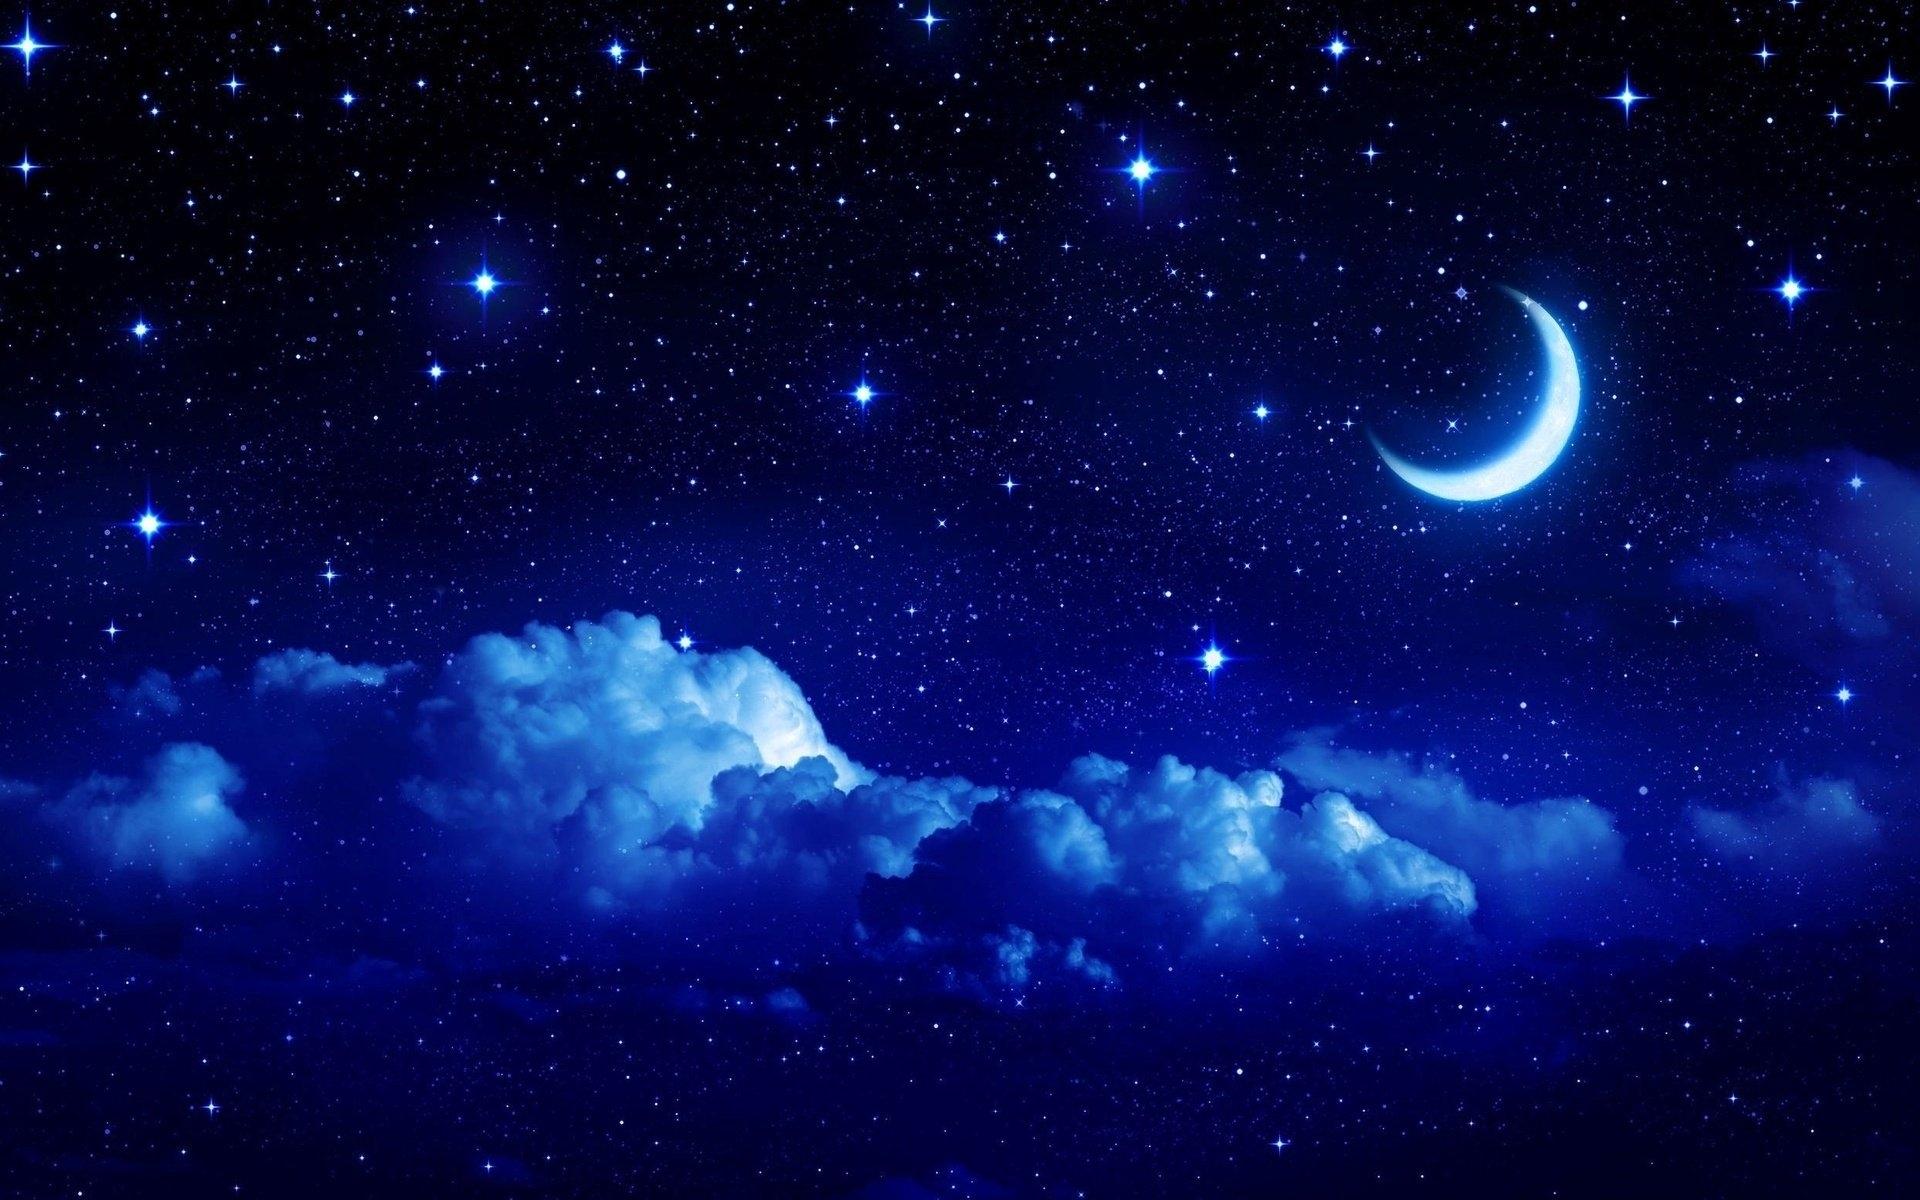 night moon romance love stars sky clouds wallpaper | 1920x1200